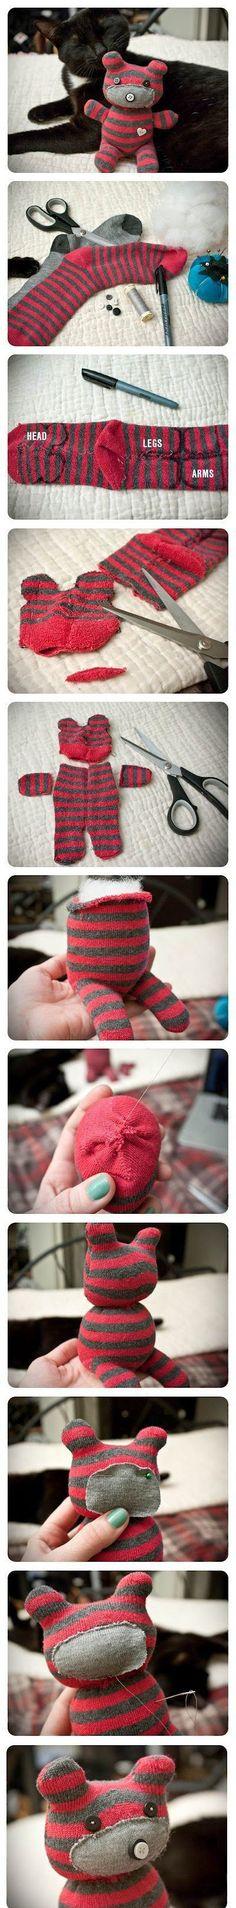 Çoraptan Oyuncak Modelleri ve Yapımı beautiful cutest funny wild basteln lustig zeichnen Sock Crafts, Cute Crafts, Crafts To Do, Fabric Crafts, Sewing Crafts, Craft Projects, Crafts For Kids, Craft Ideas, Sewing Projects